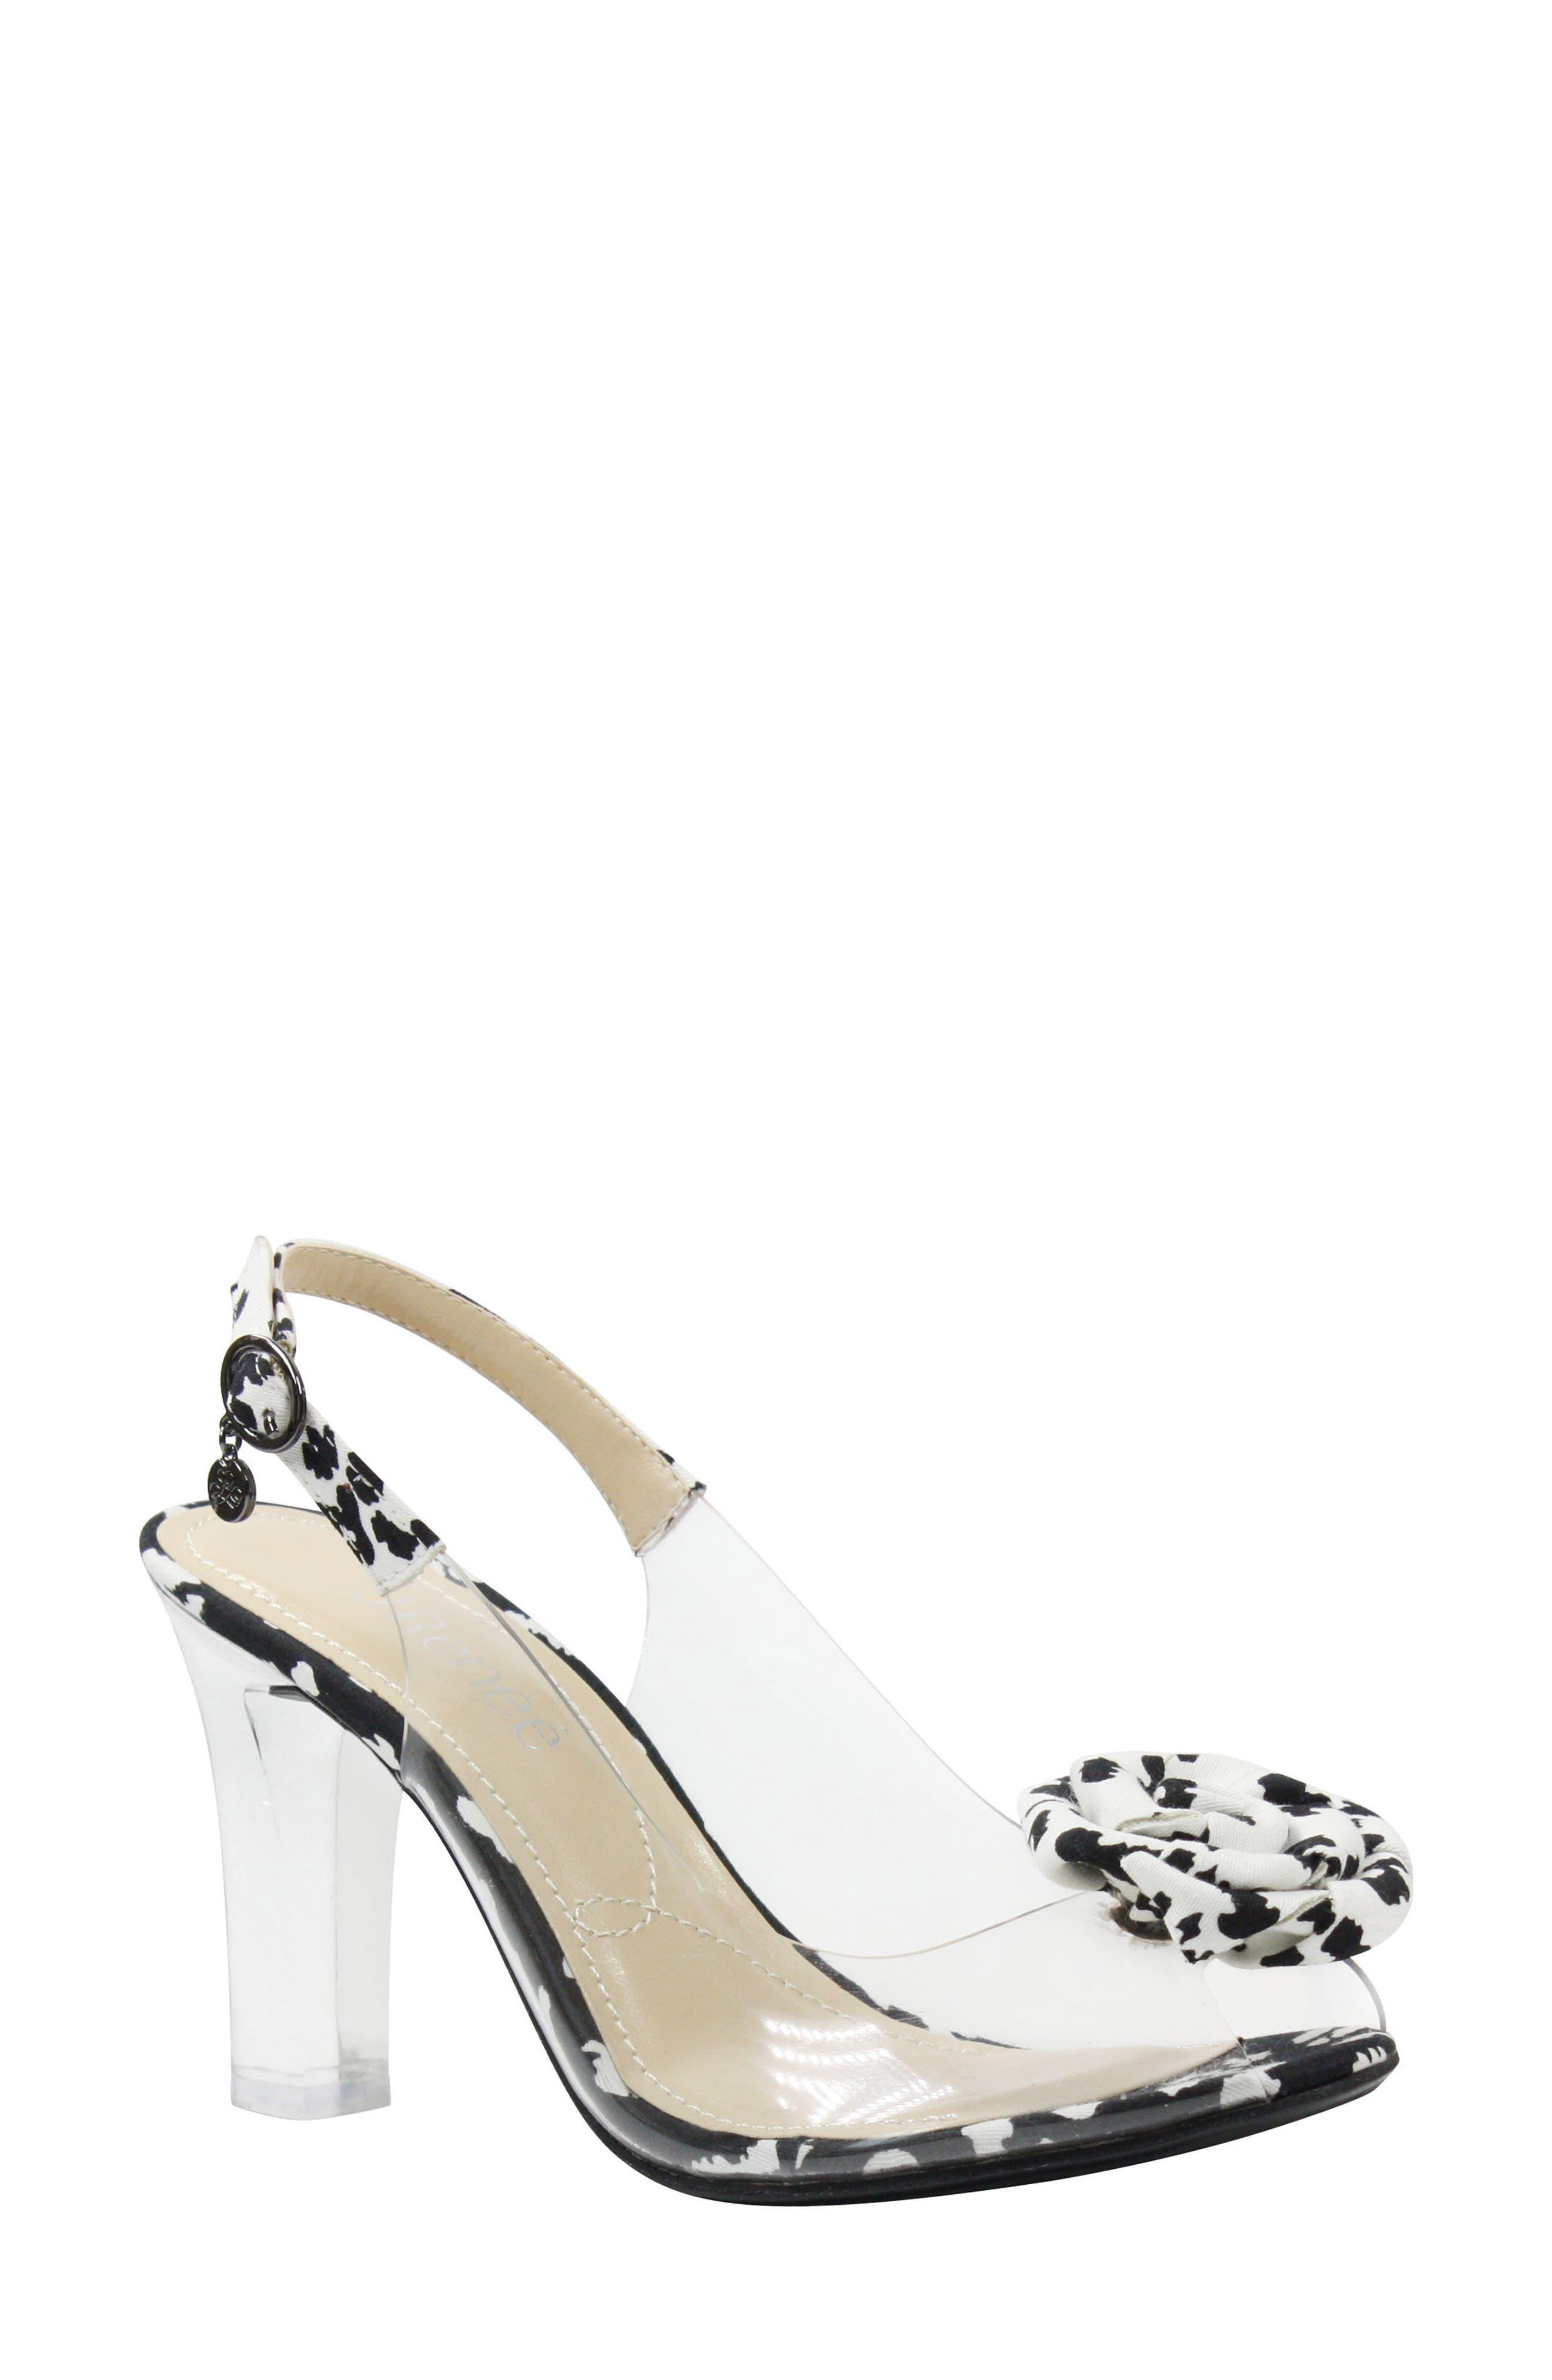 J. Renee Adoracion Slingback Sandal, Black